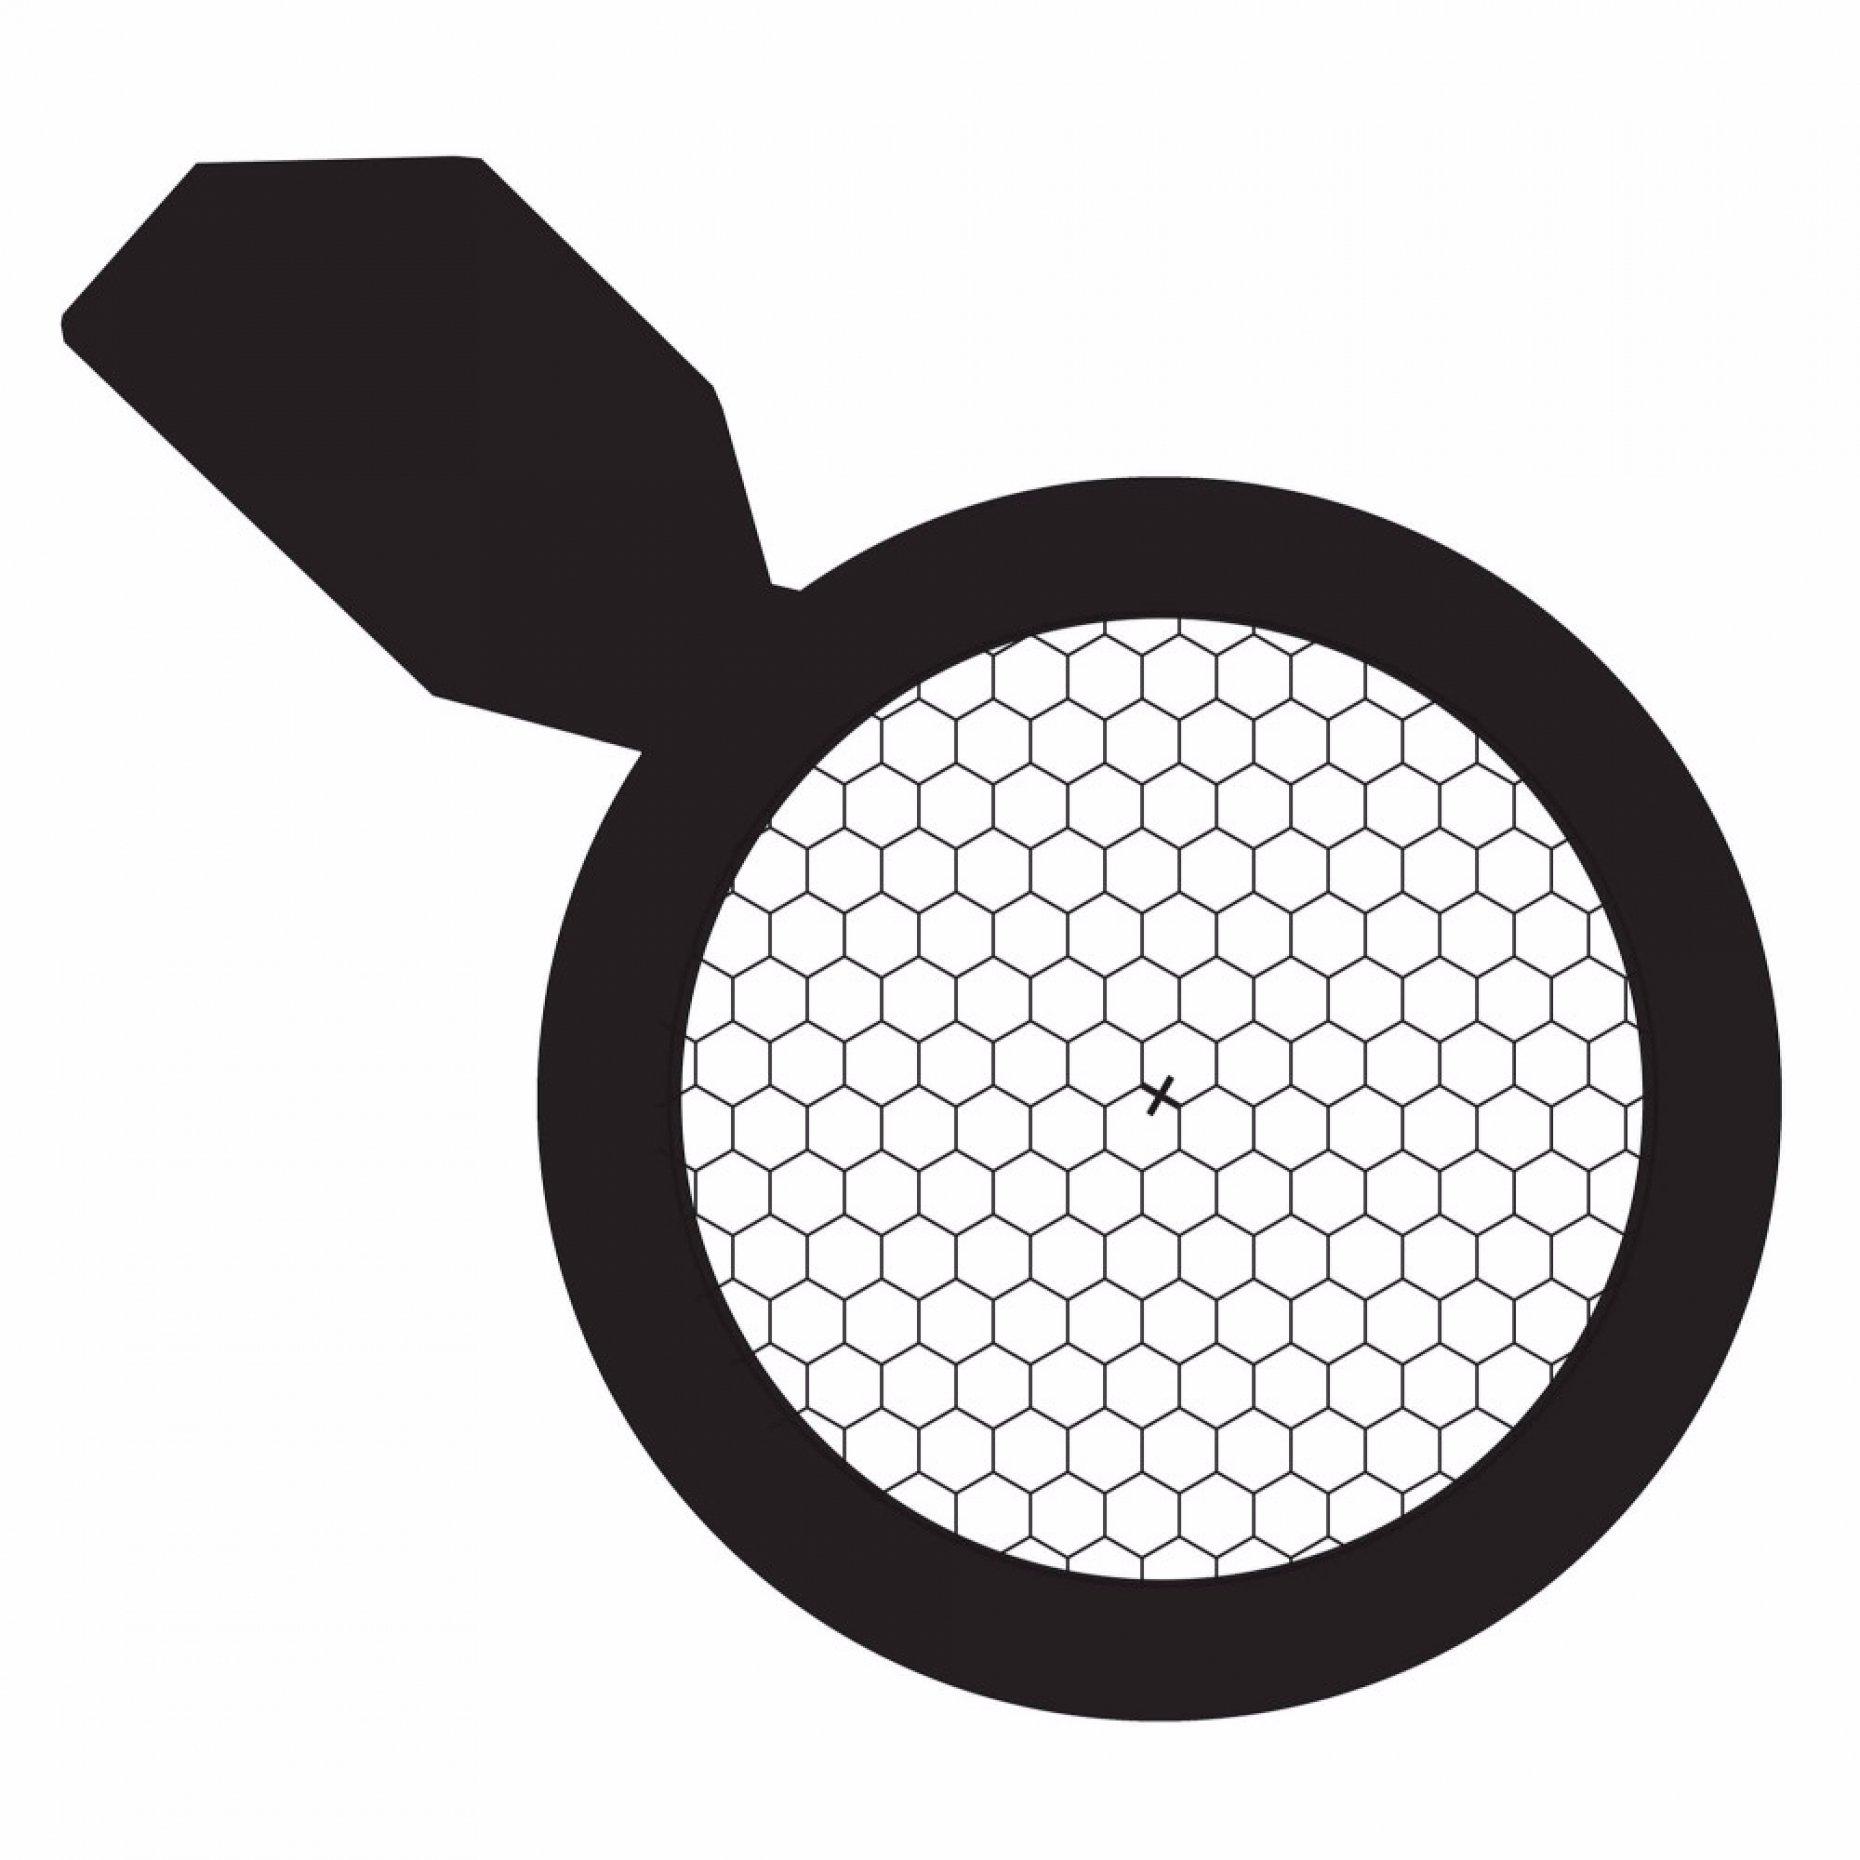 135 Mesh Hexagonal Grid with Handle